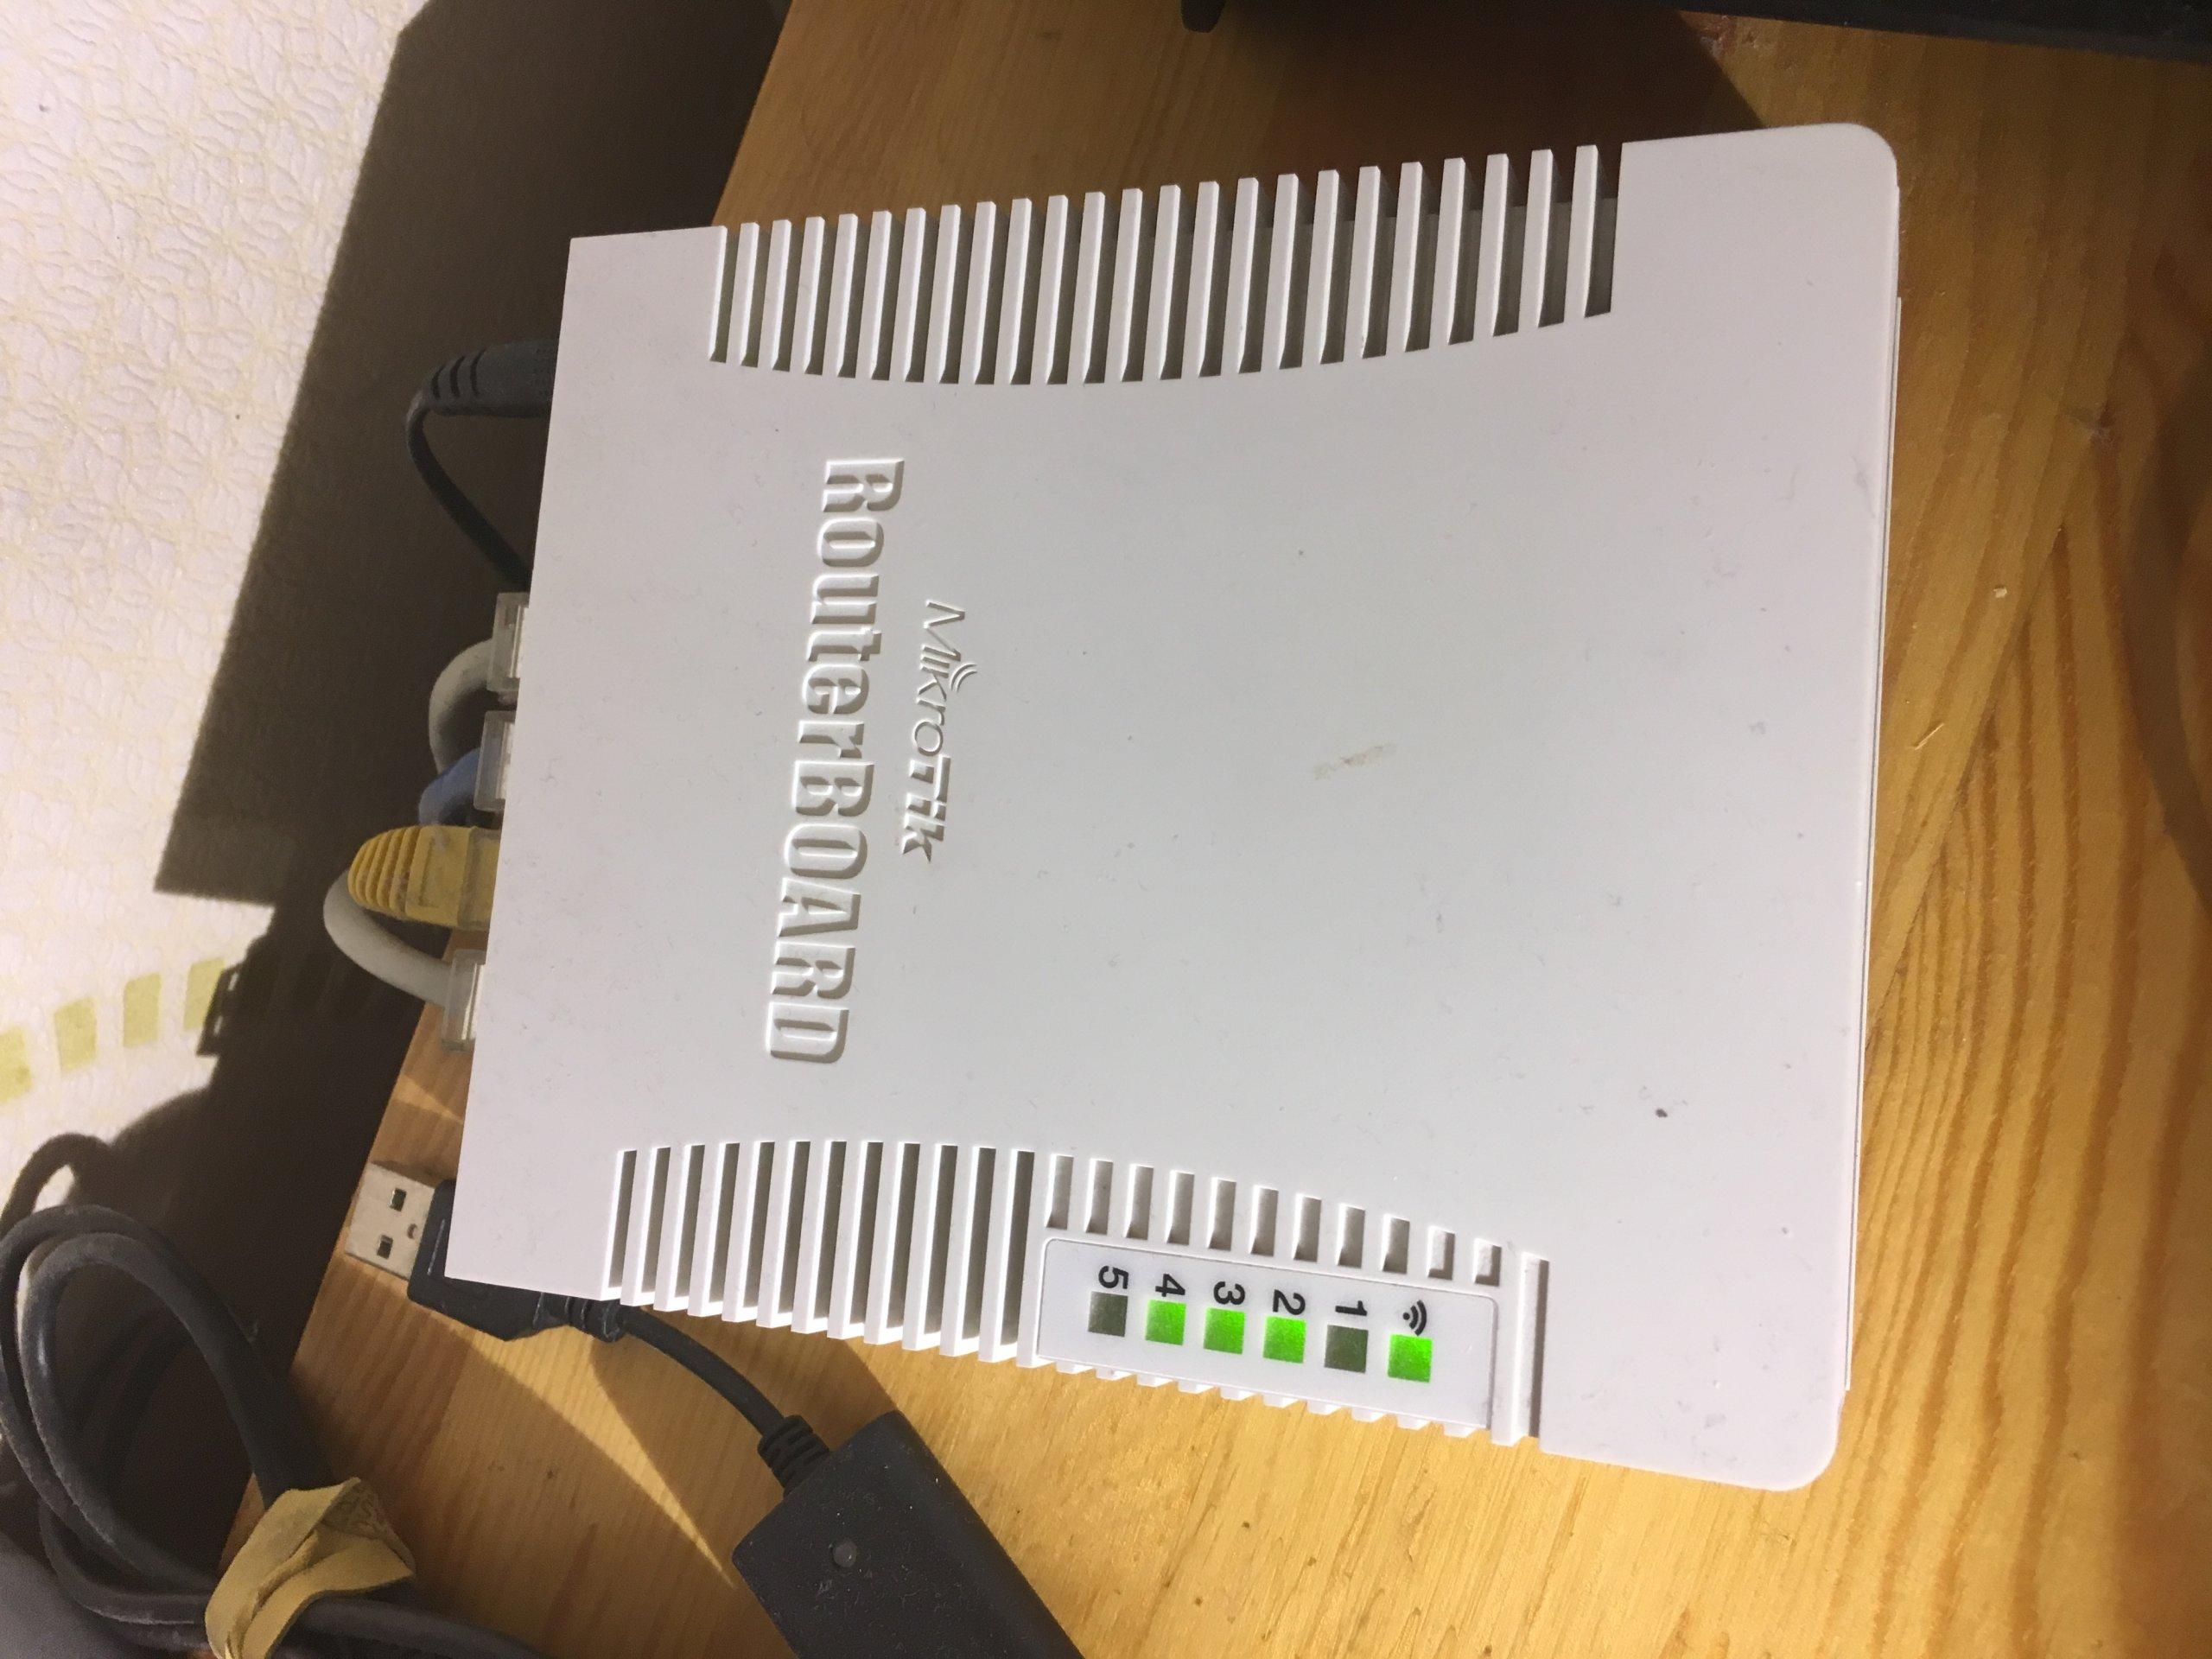 Router Mikrotik Rb951g 2hnd Jak Nowy Wifi Gigabit 7180699521